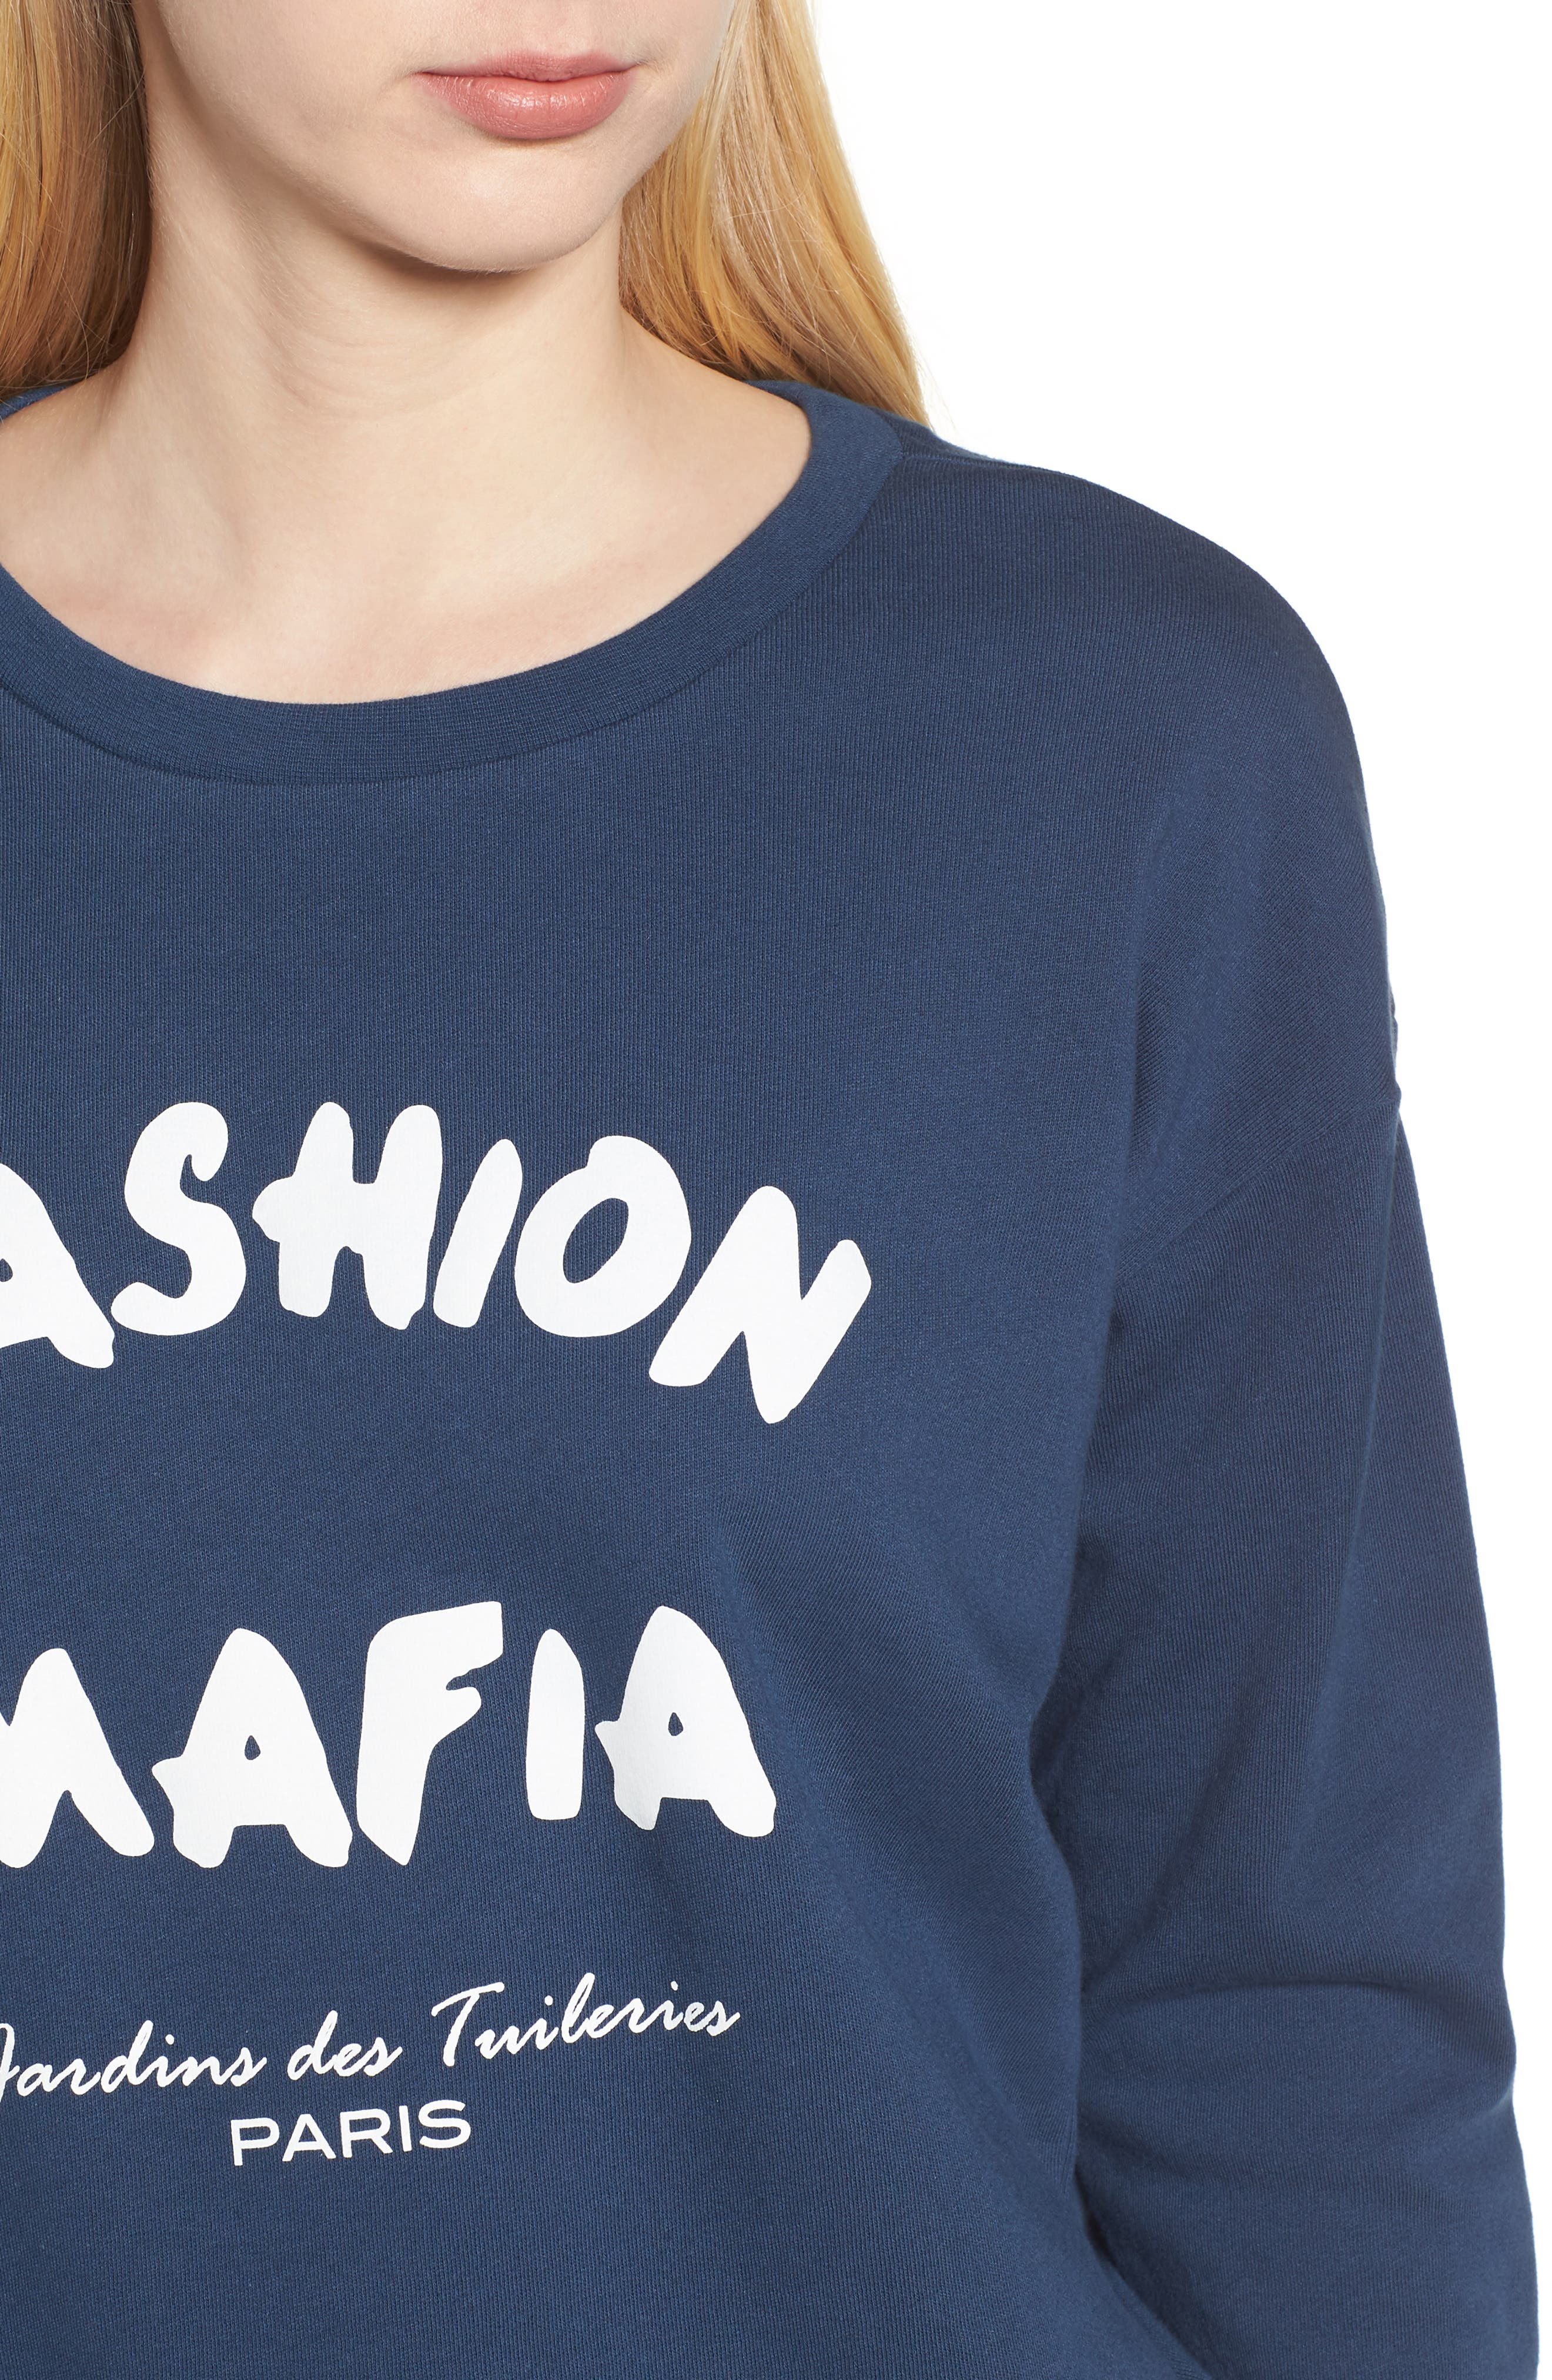 Alexa - Fashion Mafia Sweatshirt,                             Alternate thumbnail 4, color,                             400